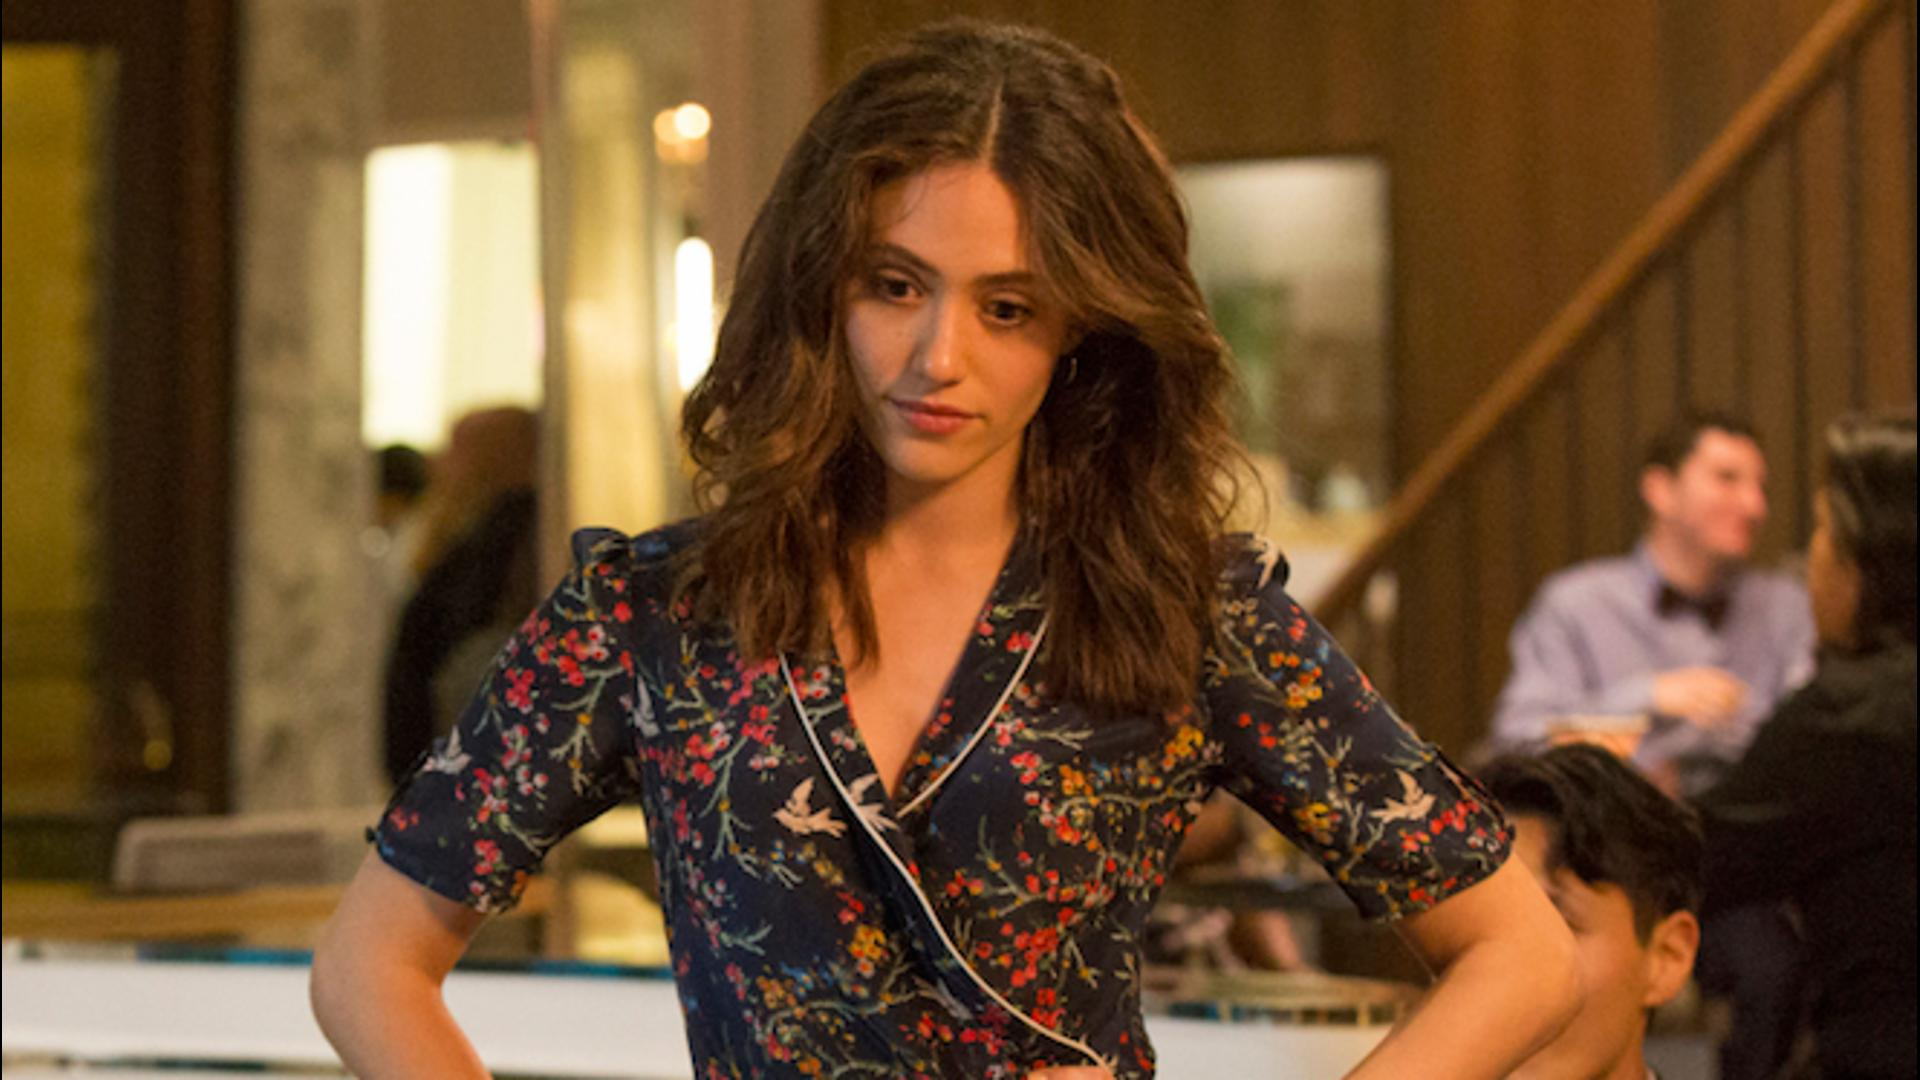 'Shameless' - Emmy Rossum on Fiona Gallagher in Season 9 screen capture